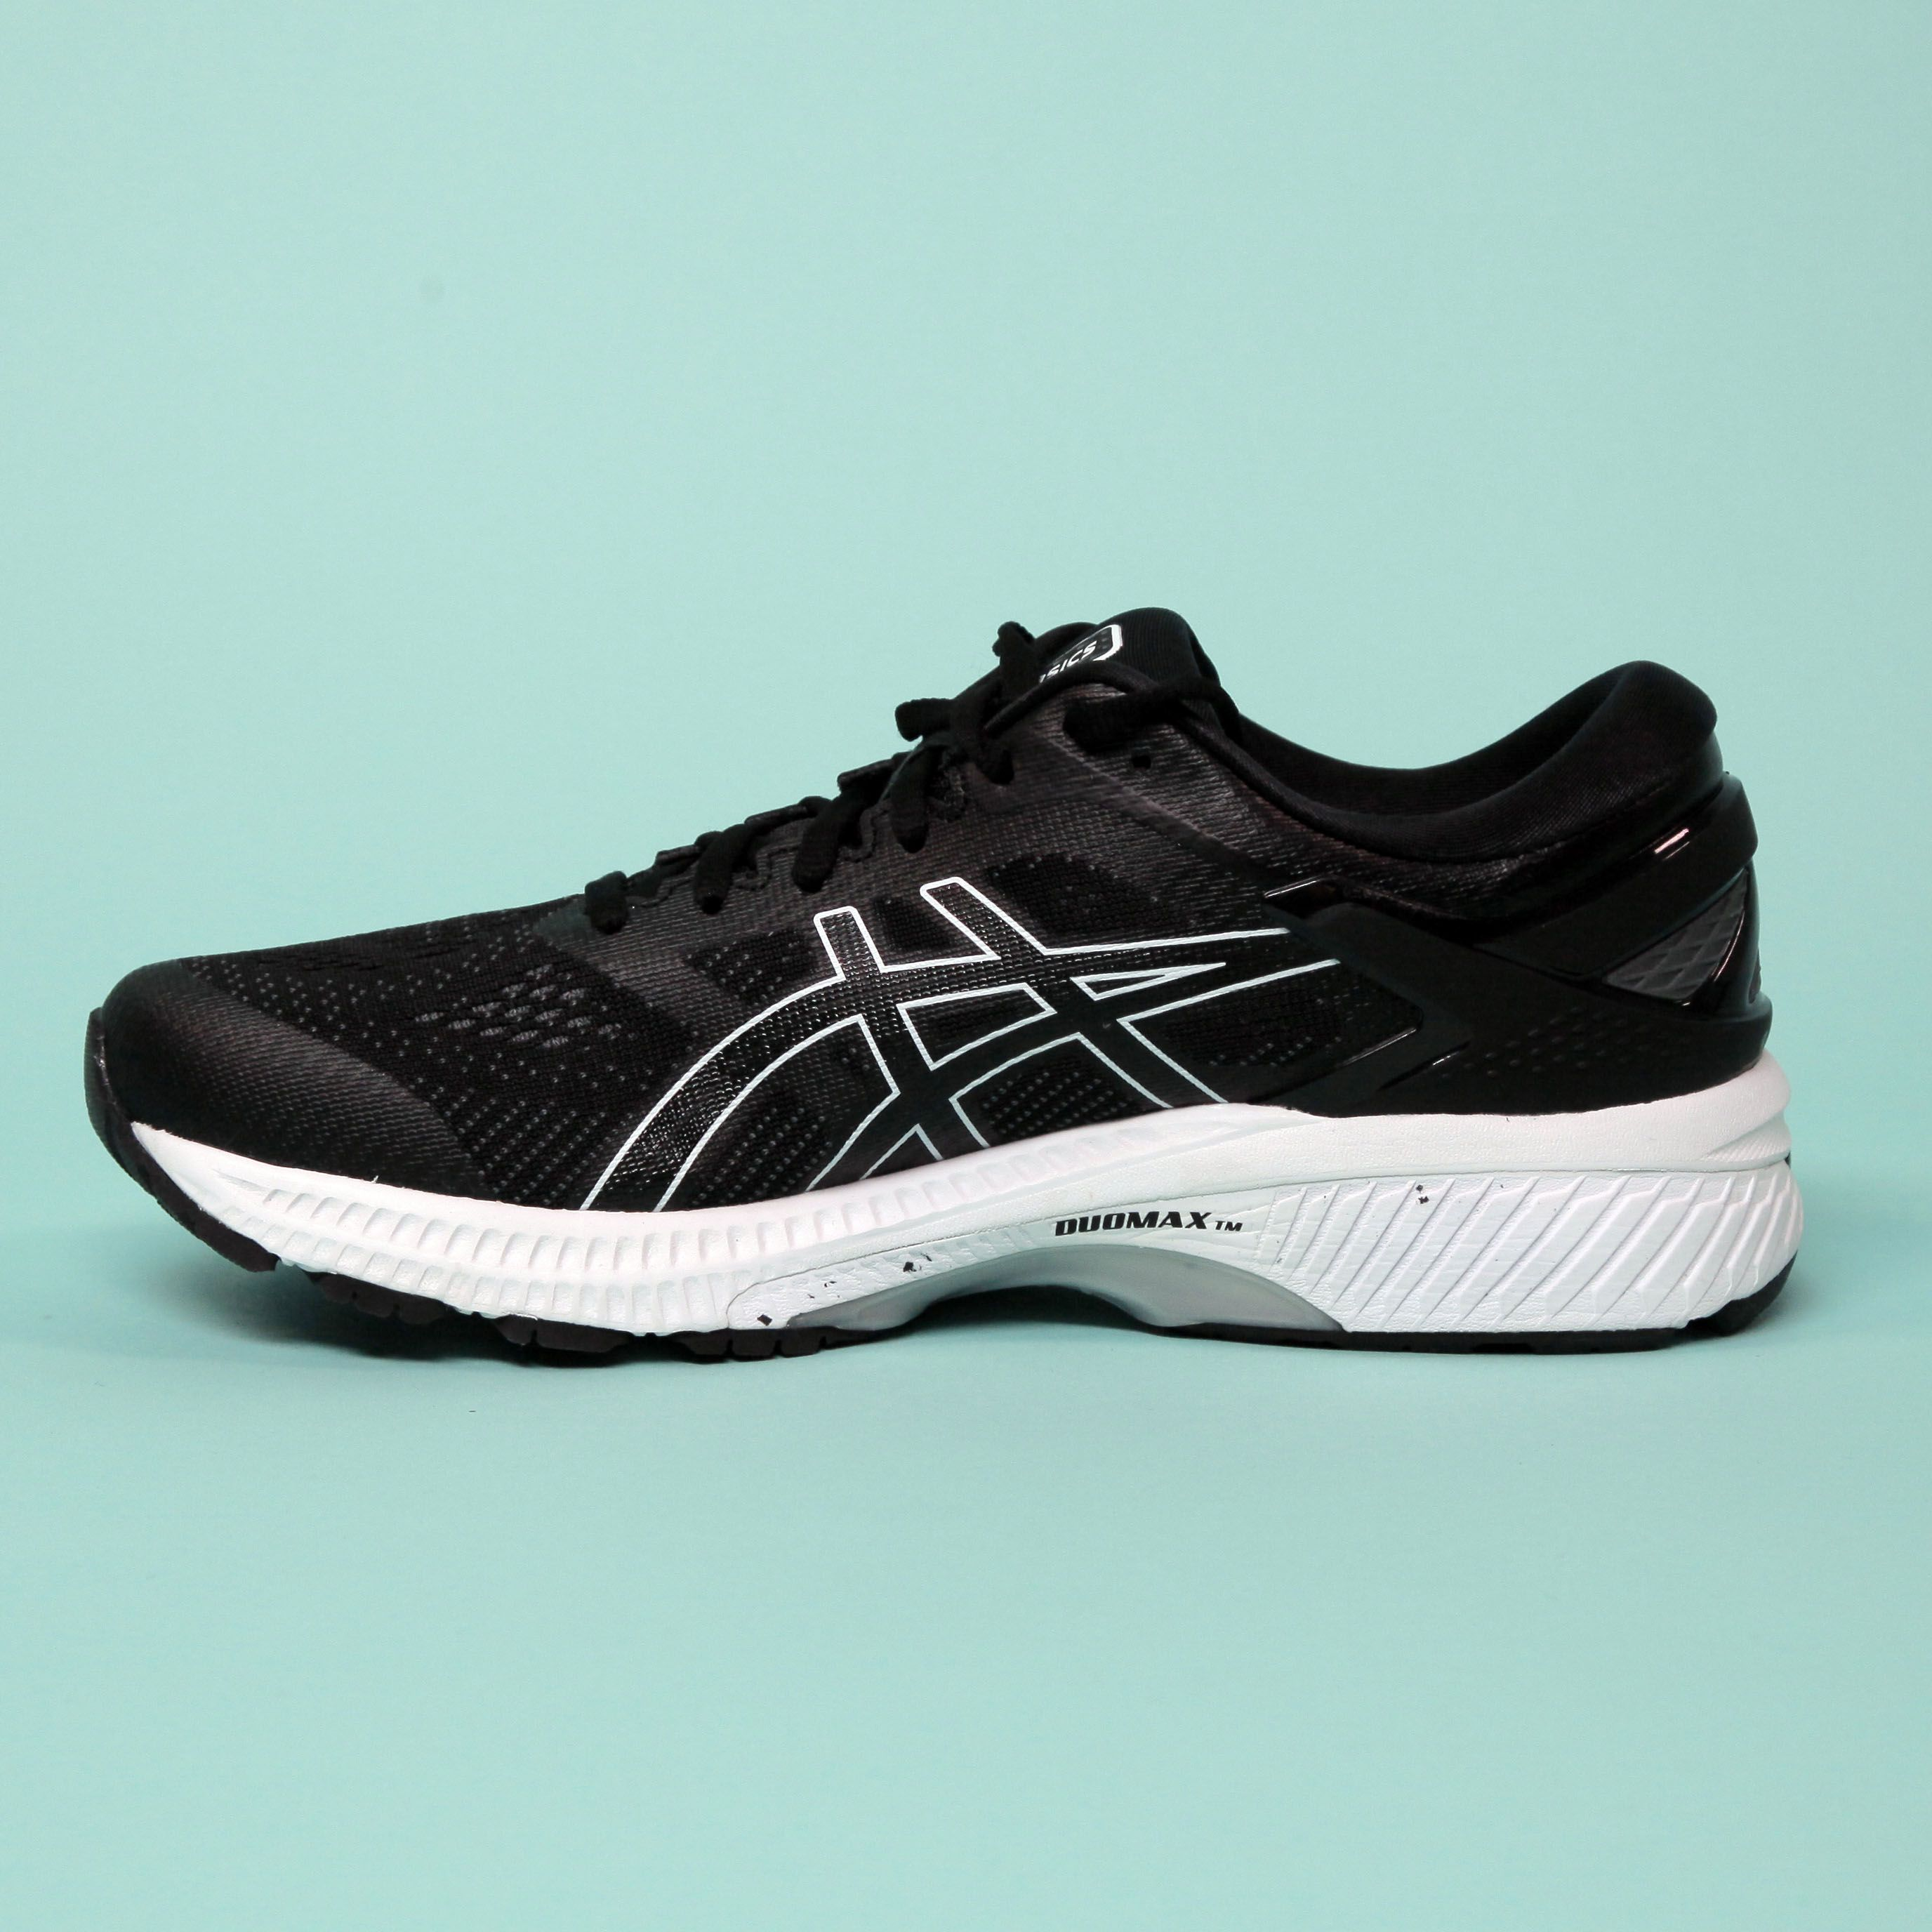 asics running shoes reviews 2018